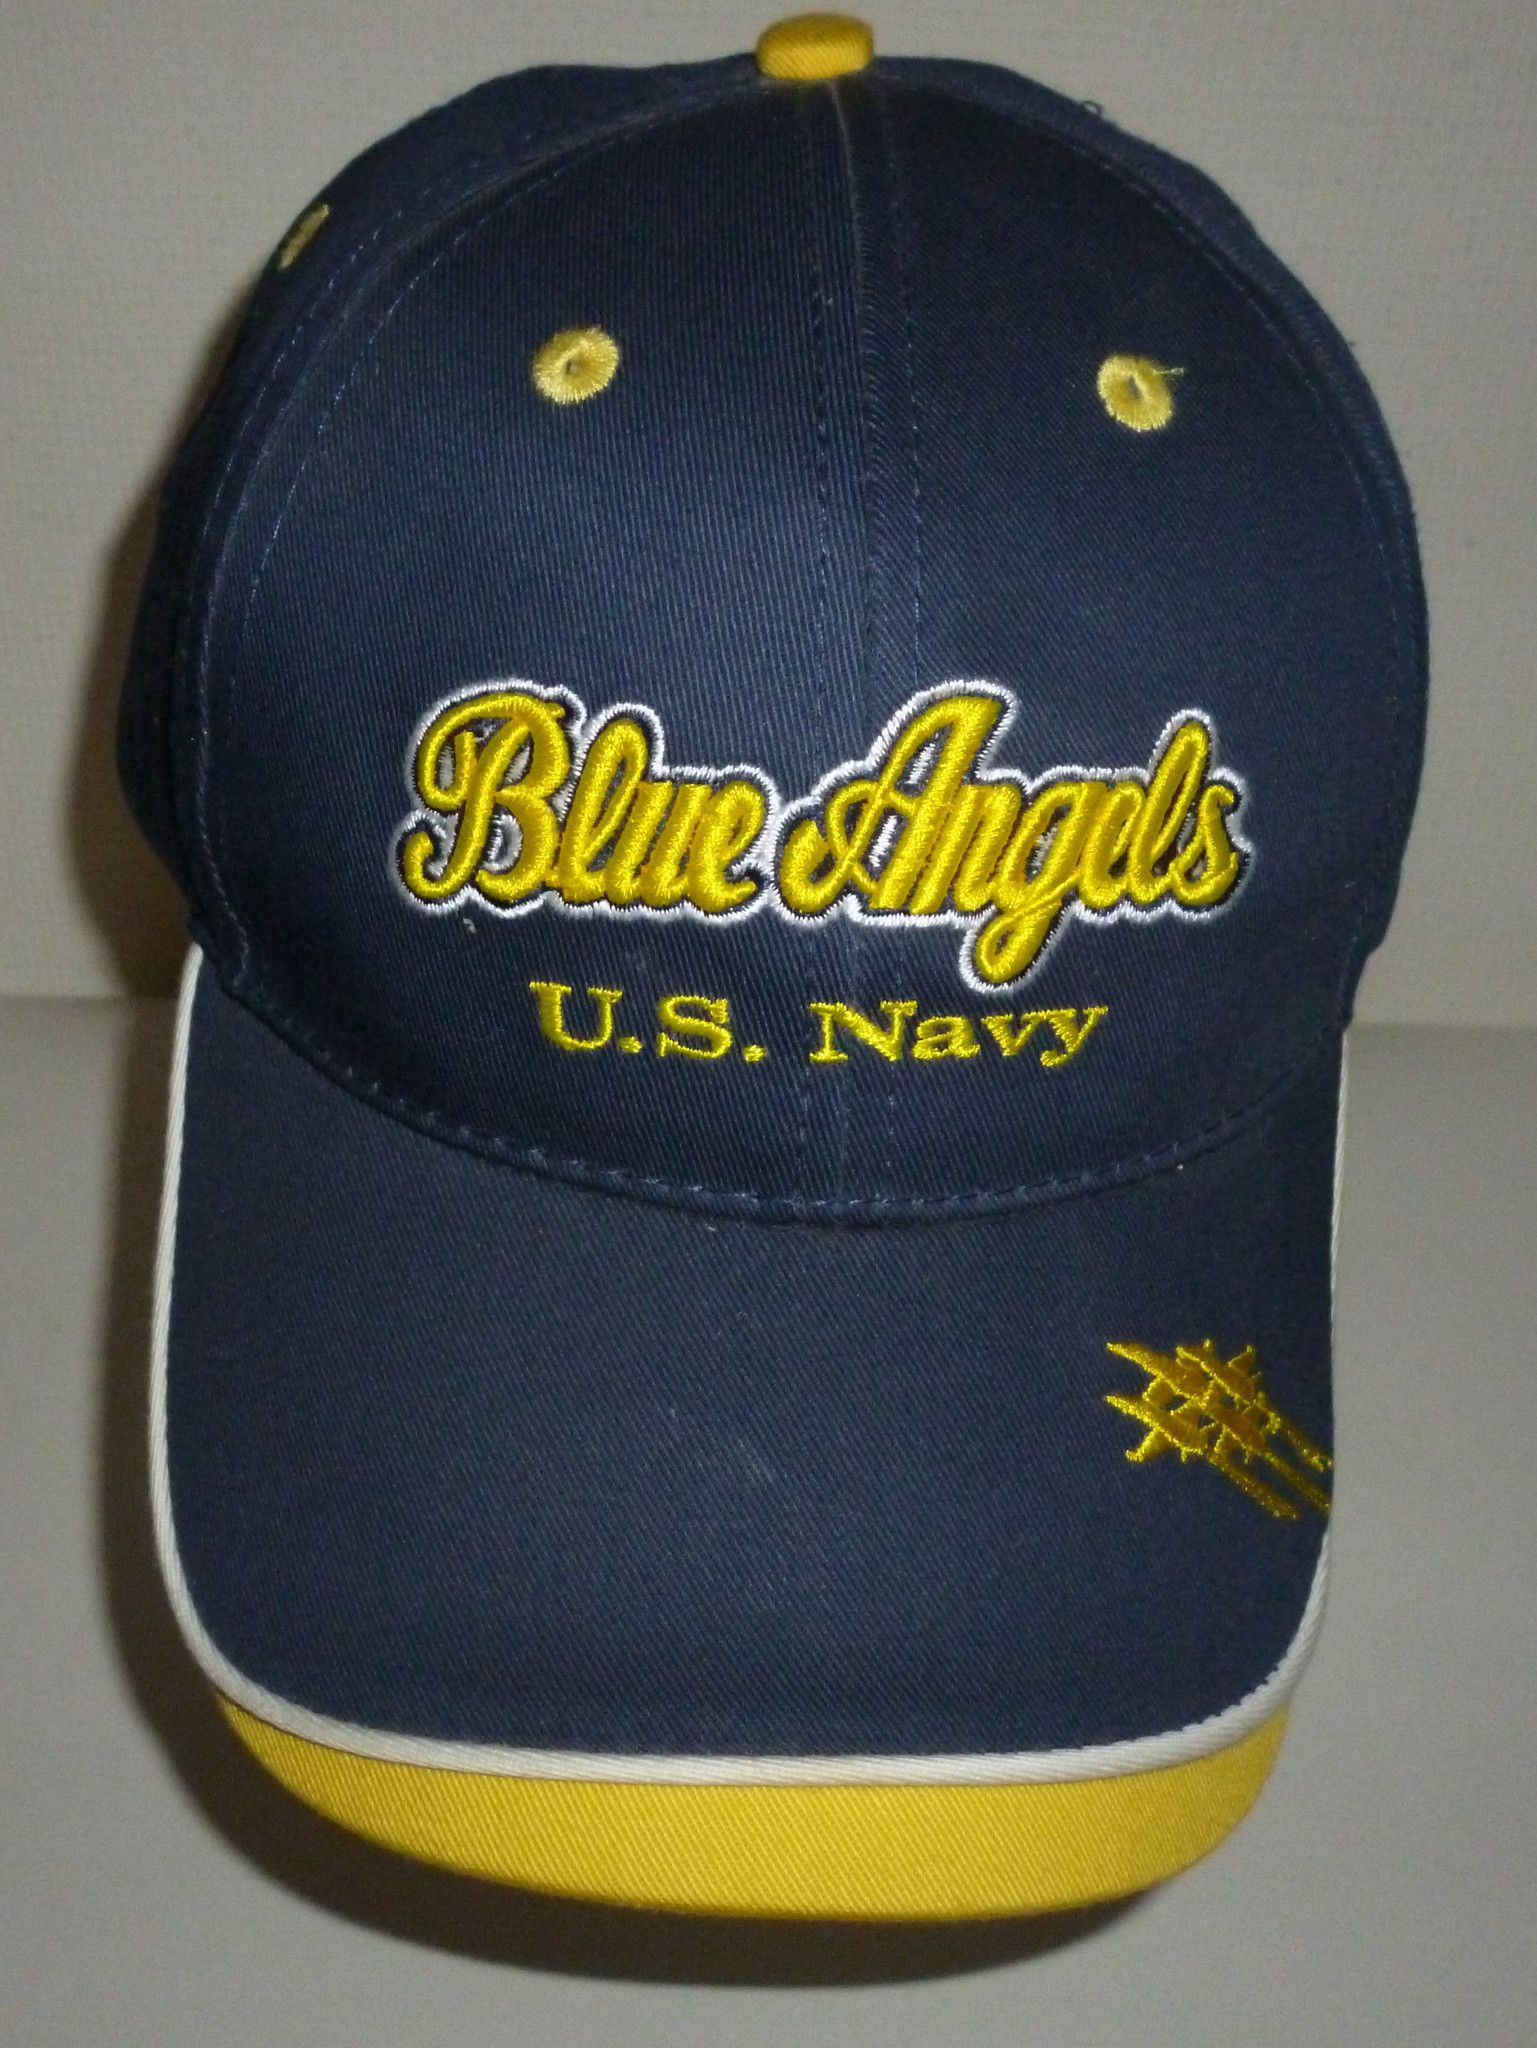 Blue Angels U.S. Navy Military Baseball Cap Hat